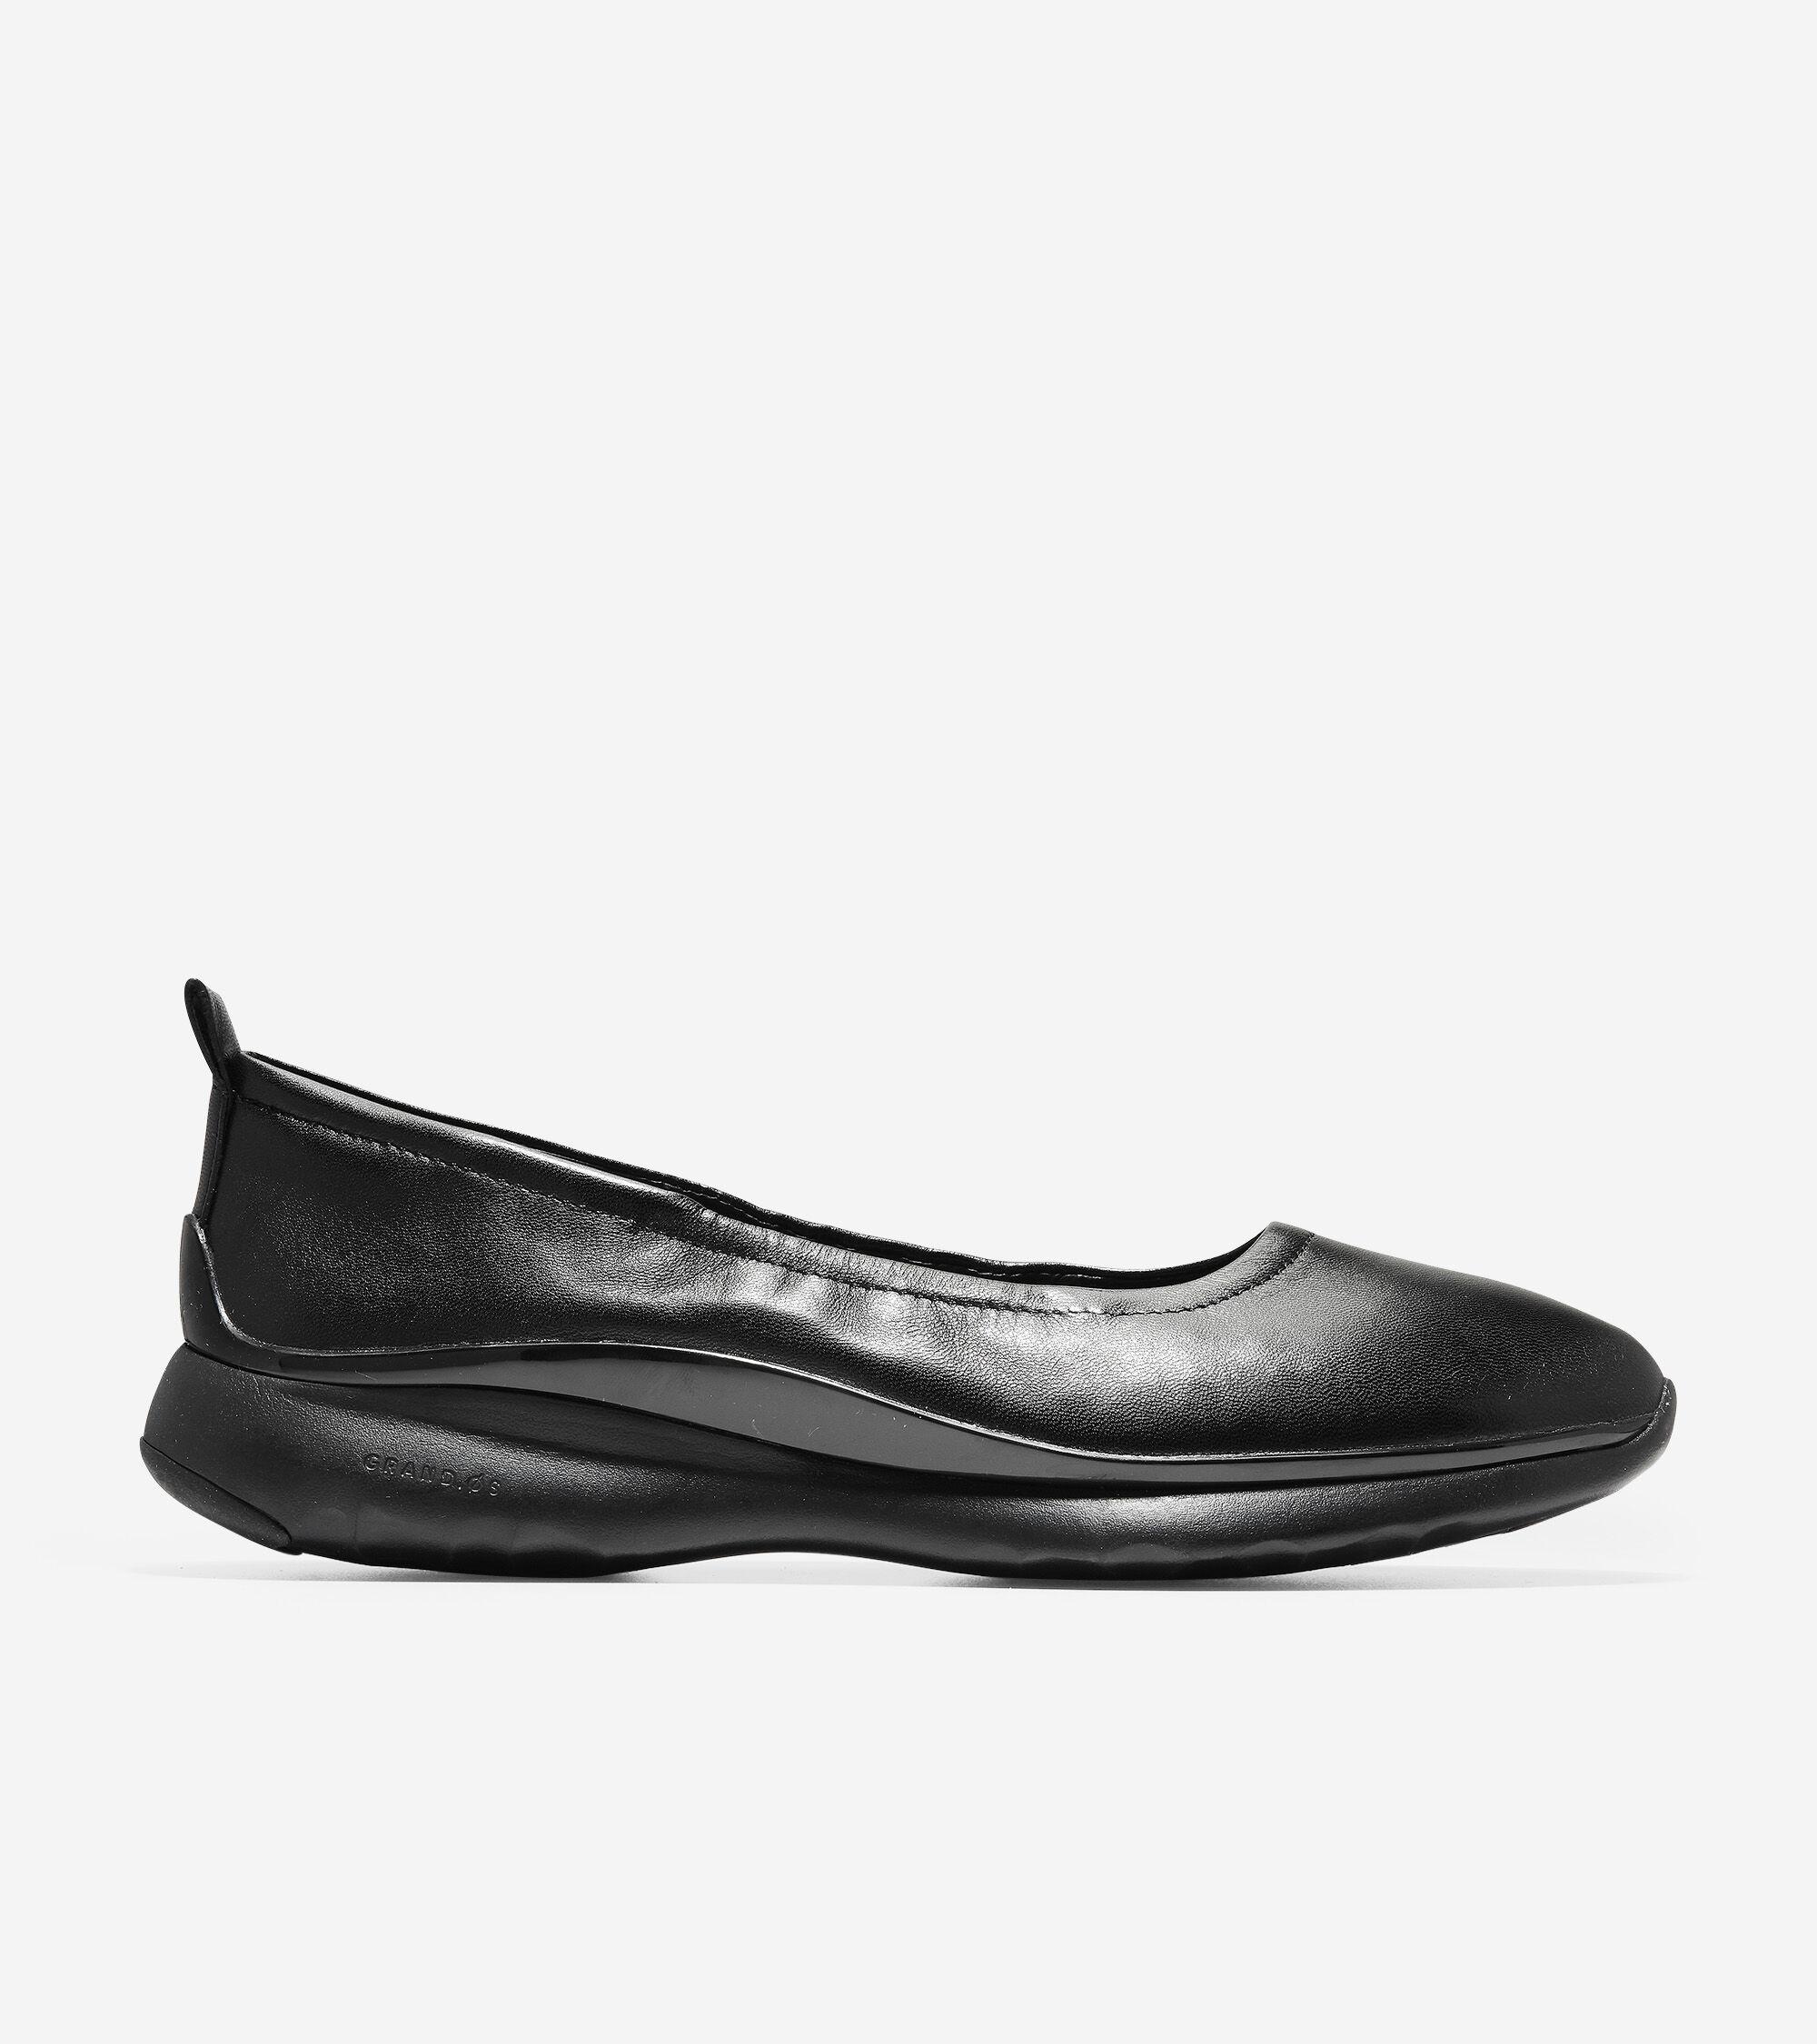 f83ba791ec7 Women s 3.ZEROGRAND Ruched Slip-On Ballet Flats in Black